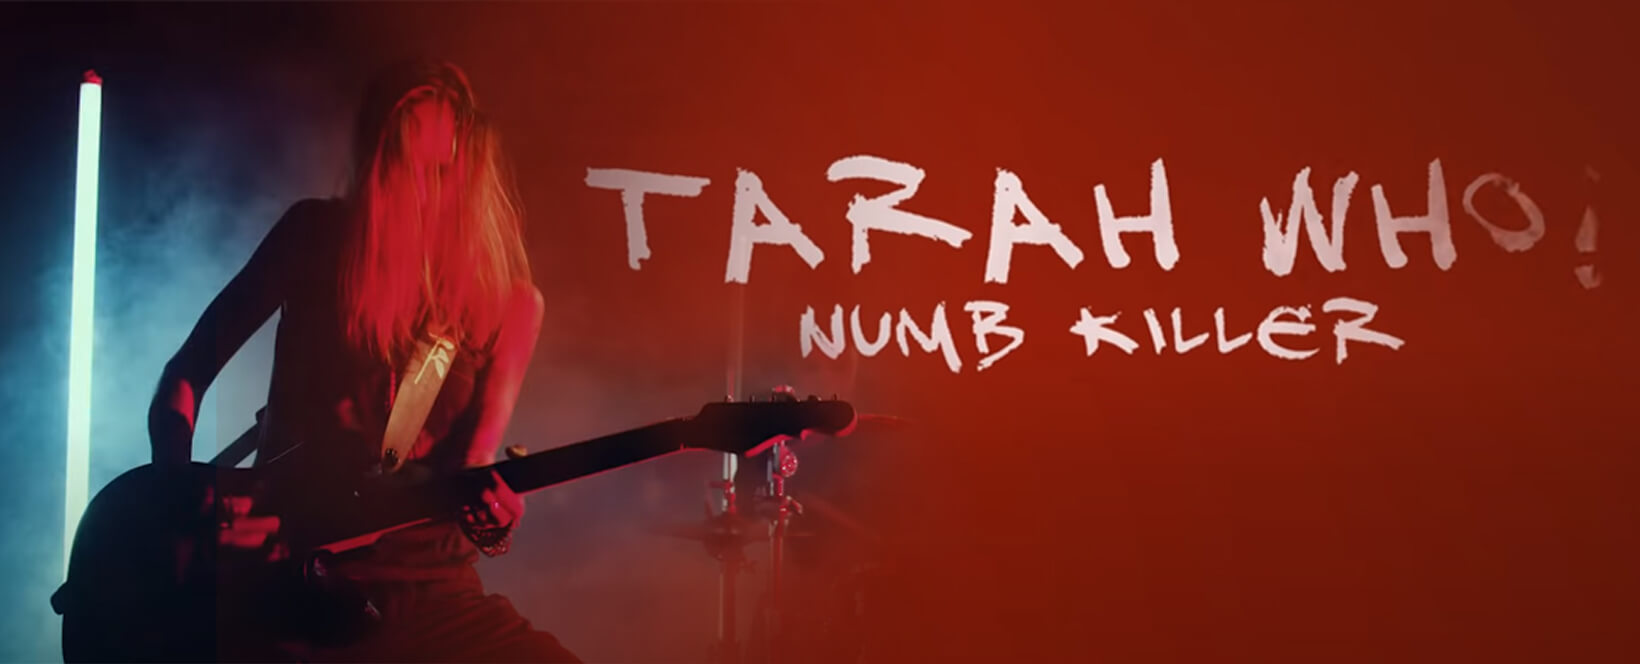 BC-353-Album - Tarah Who? - Radio Galaxie 98.5FM